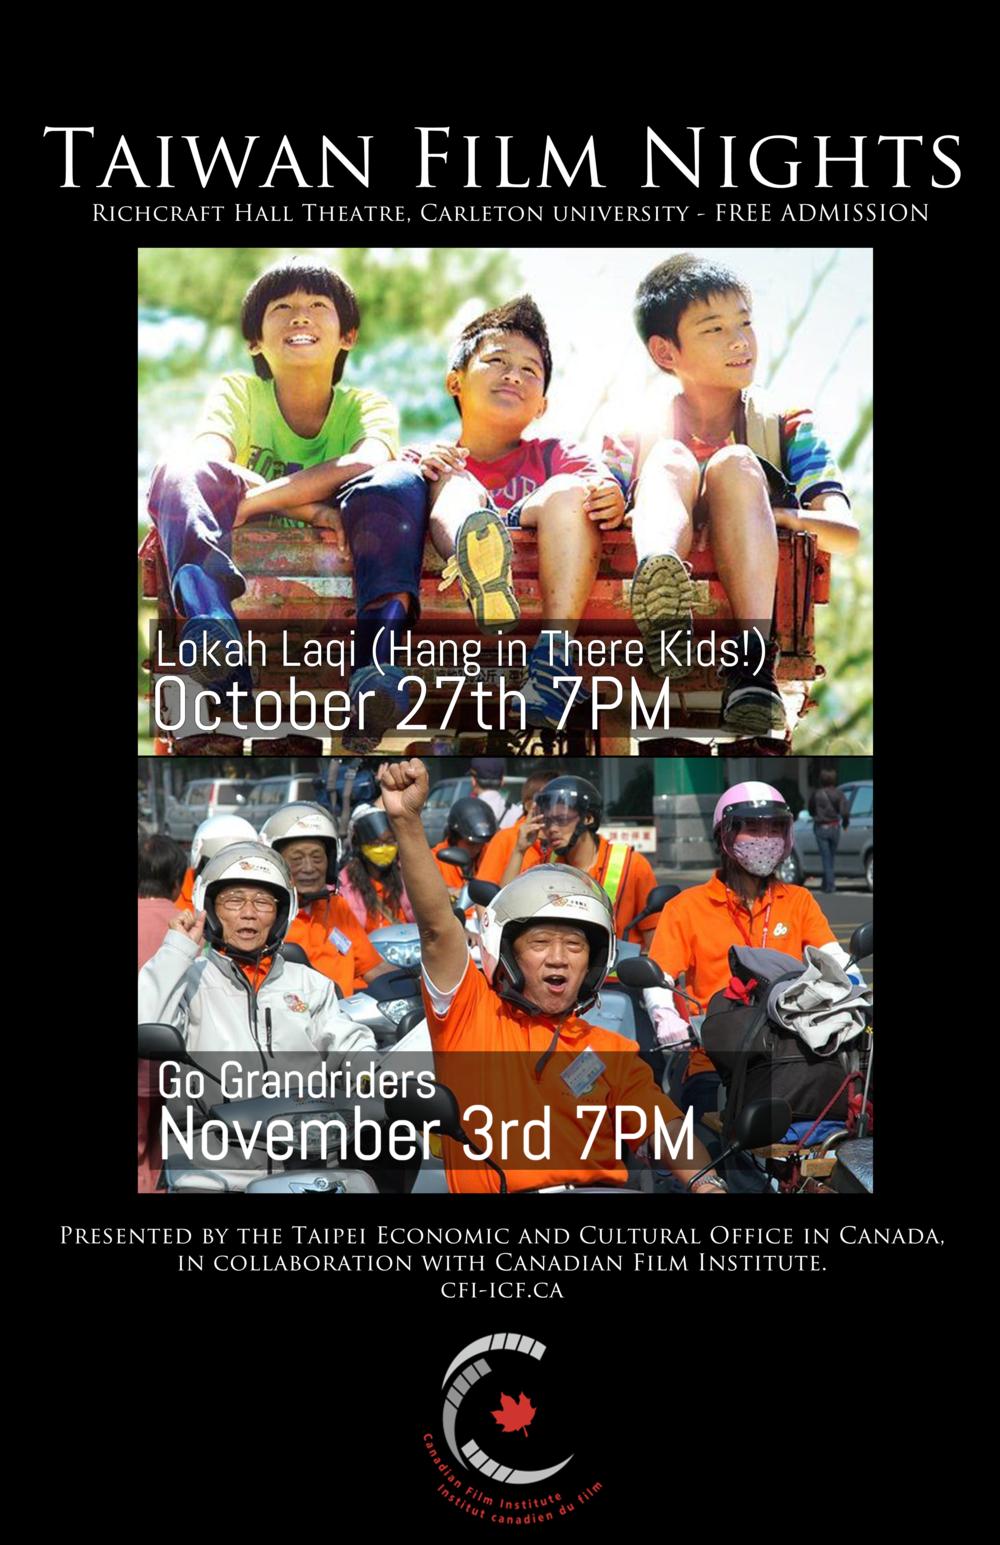 Taiwan Film Nights 004 - web.png